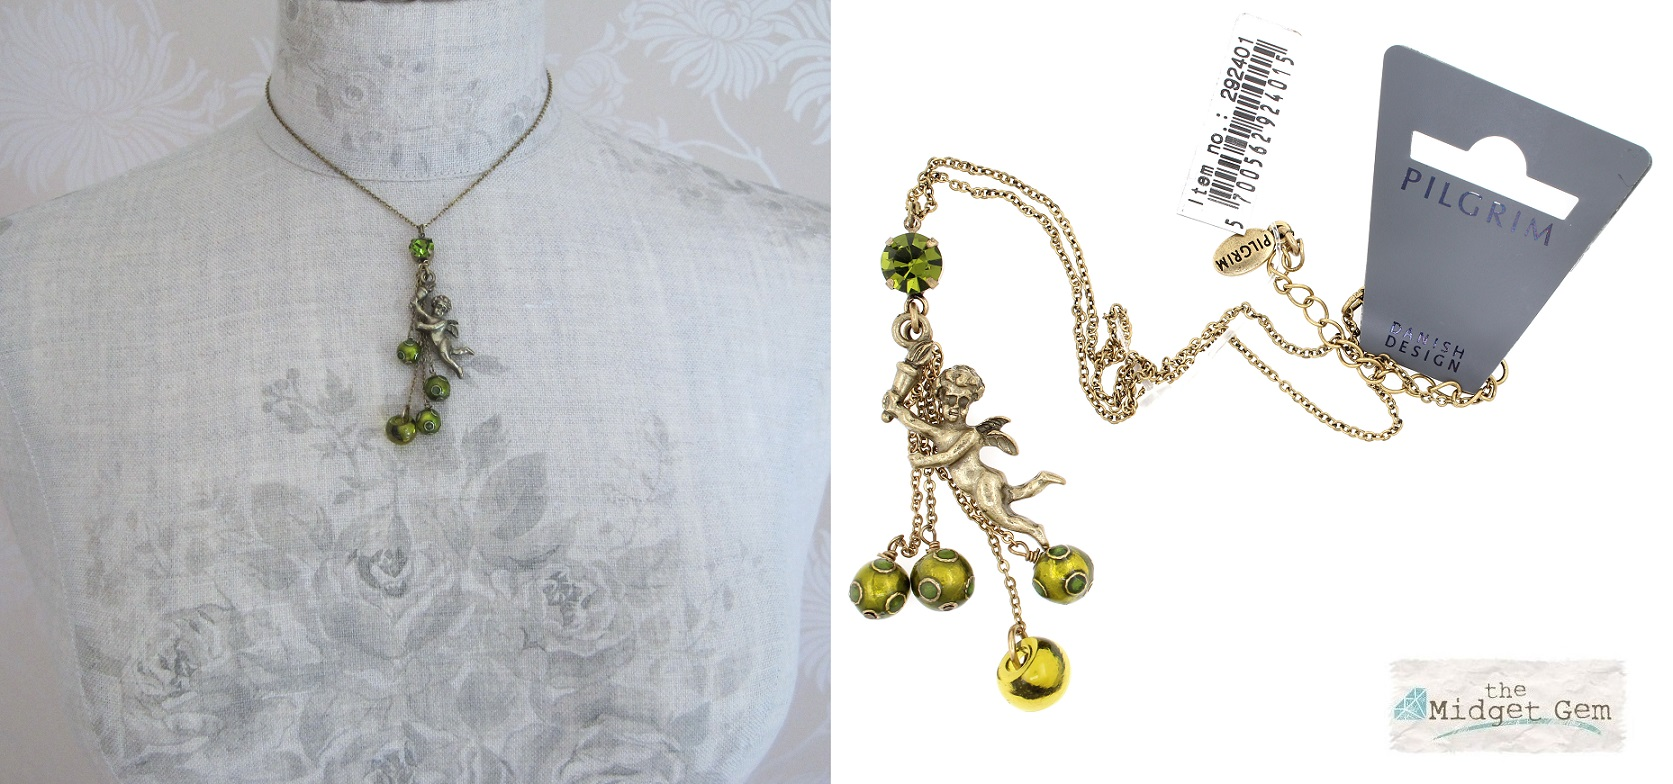 Pilgrim Cherub Charm Necklace Antique Gold Olivine Green BNWT